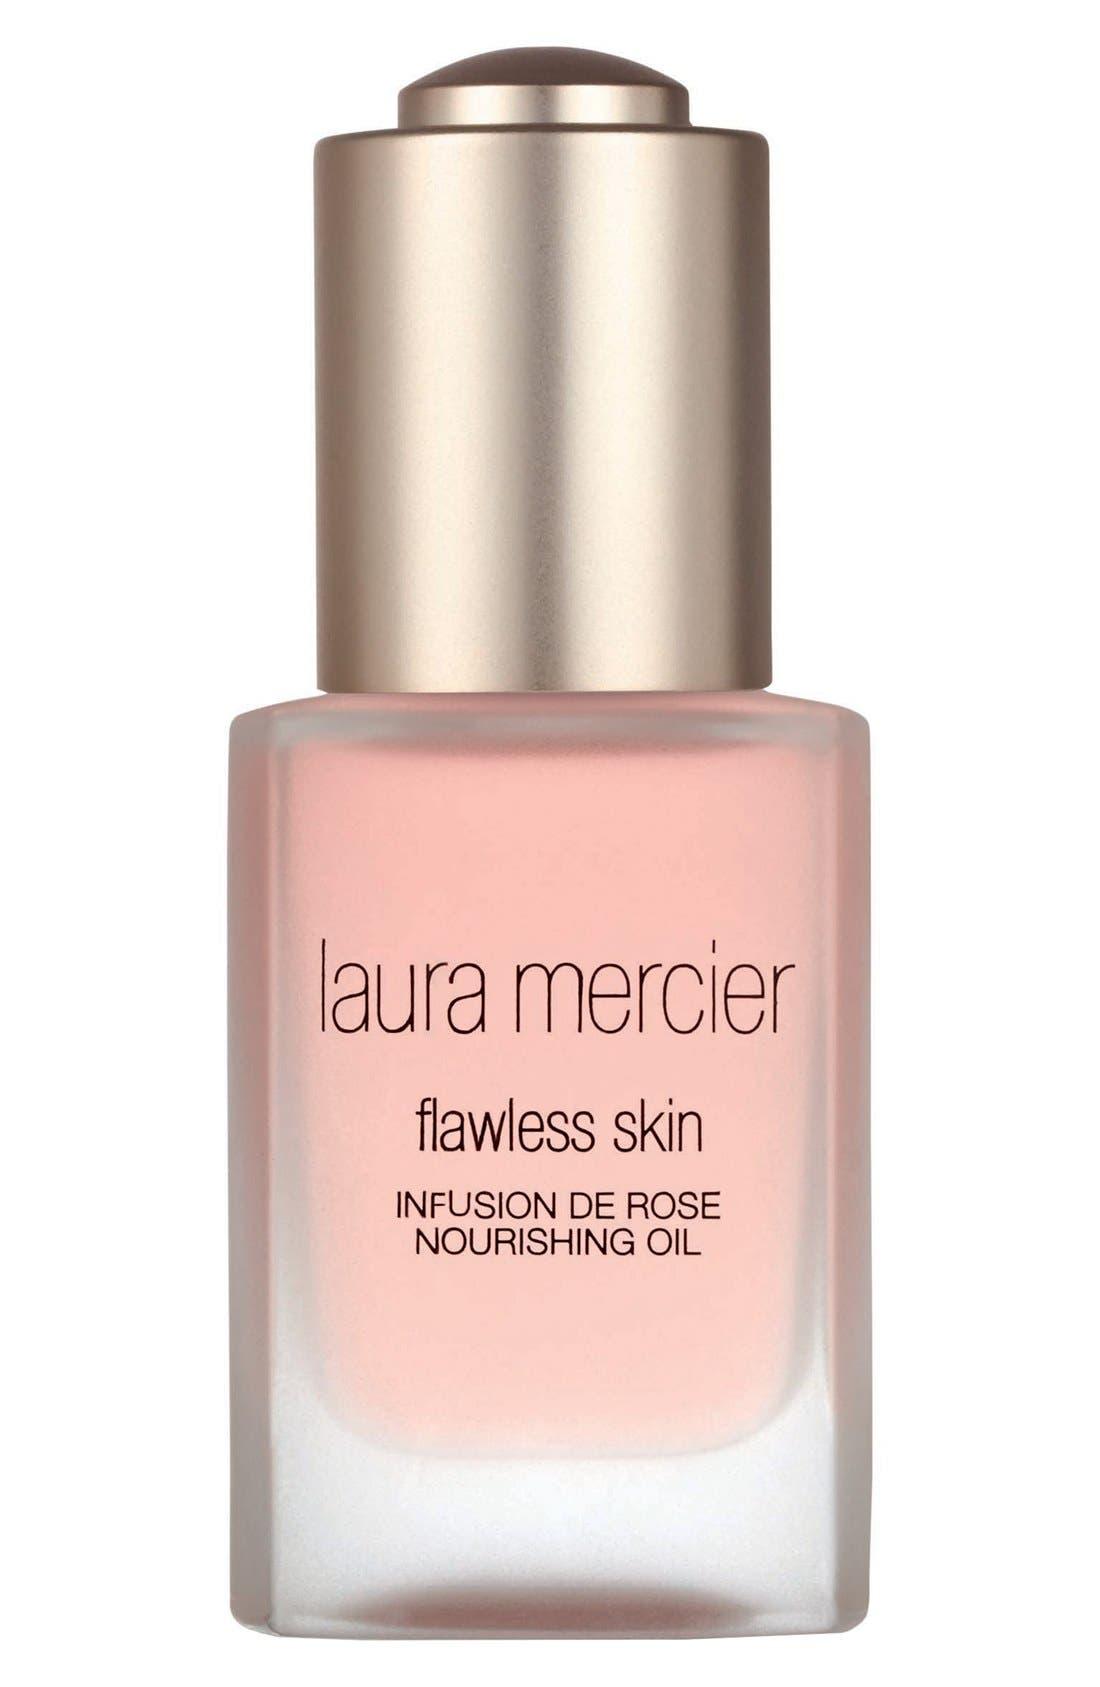 LAURA MERCIER 'Flawless Skin' Infusion de Rose Nourishing Oil, Main, color, NO COLOR